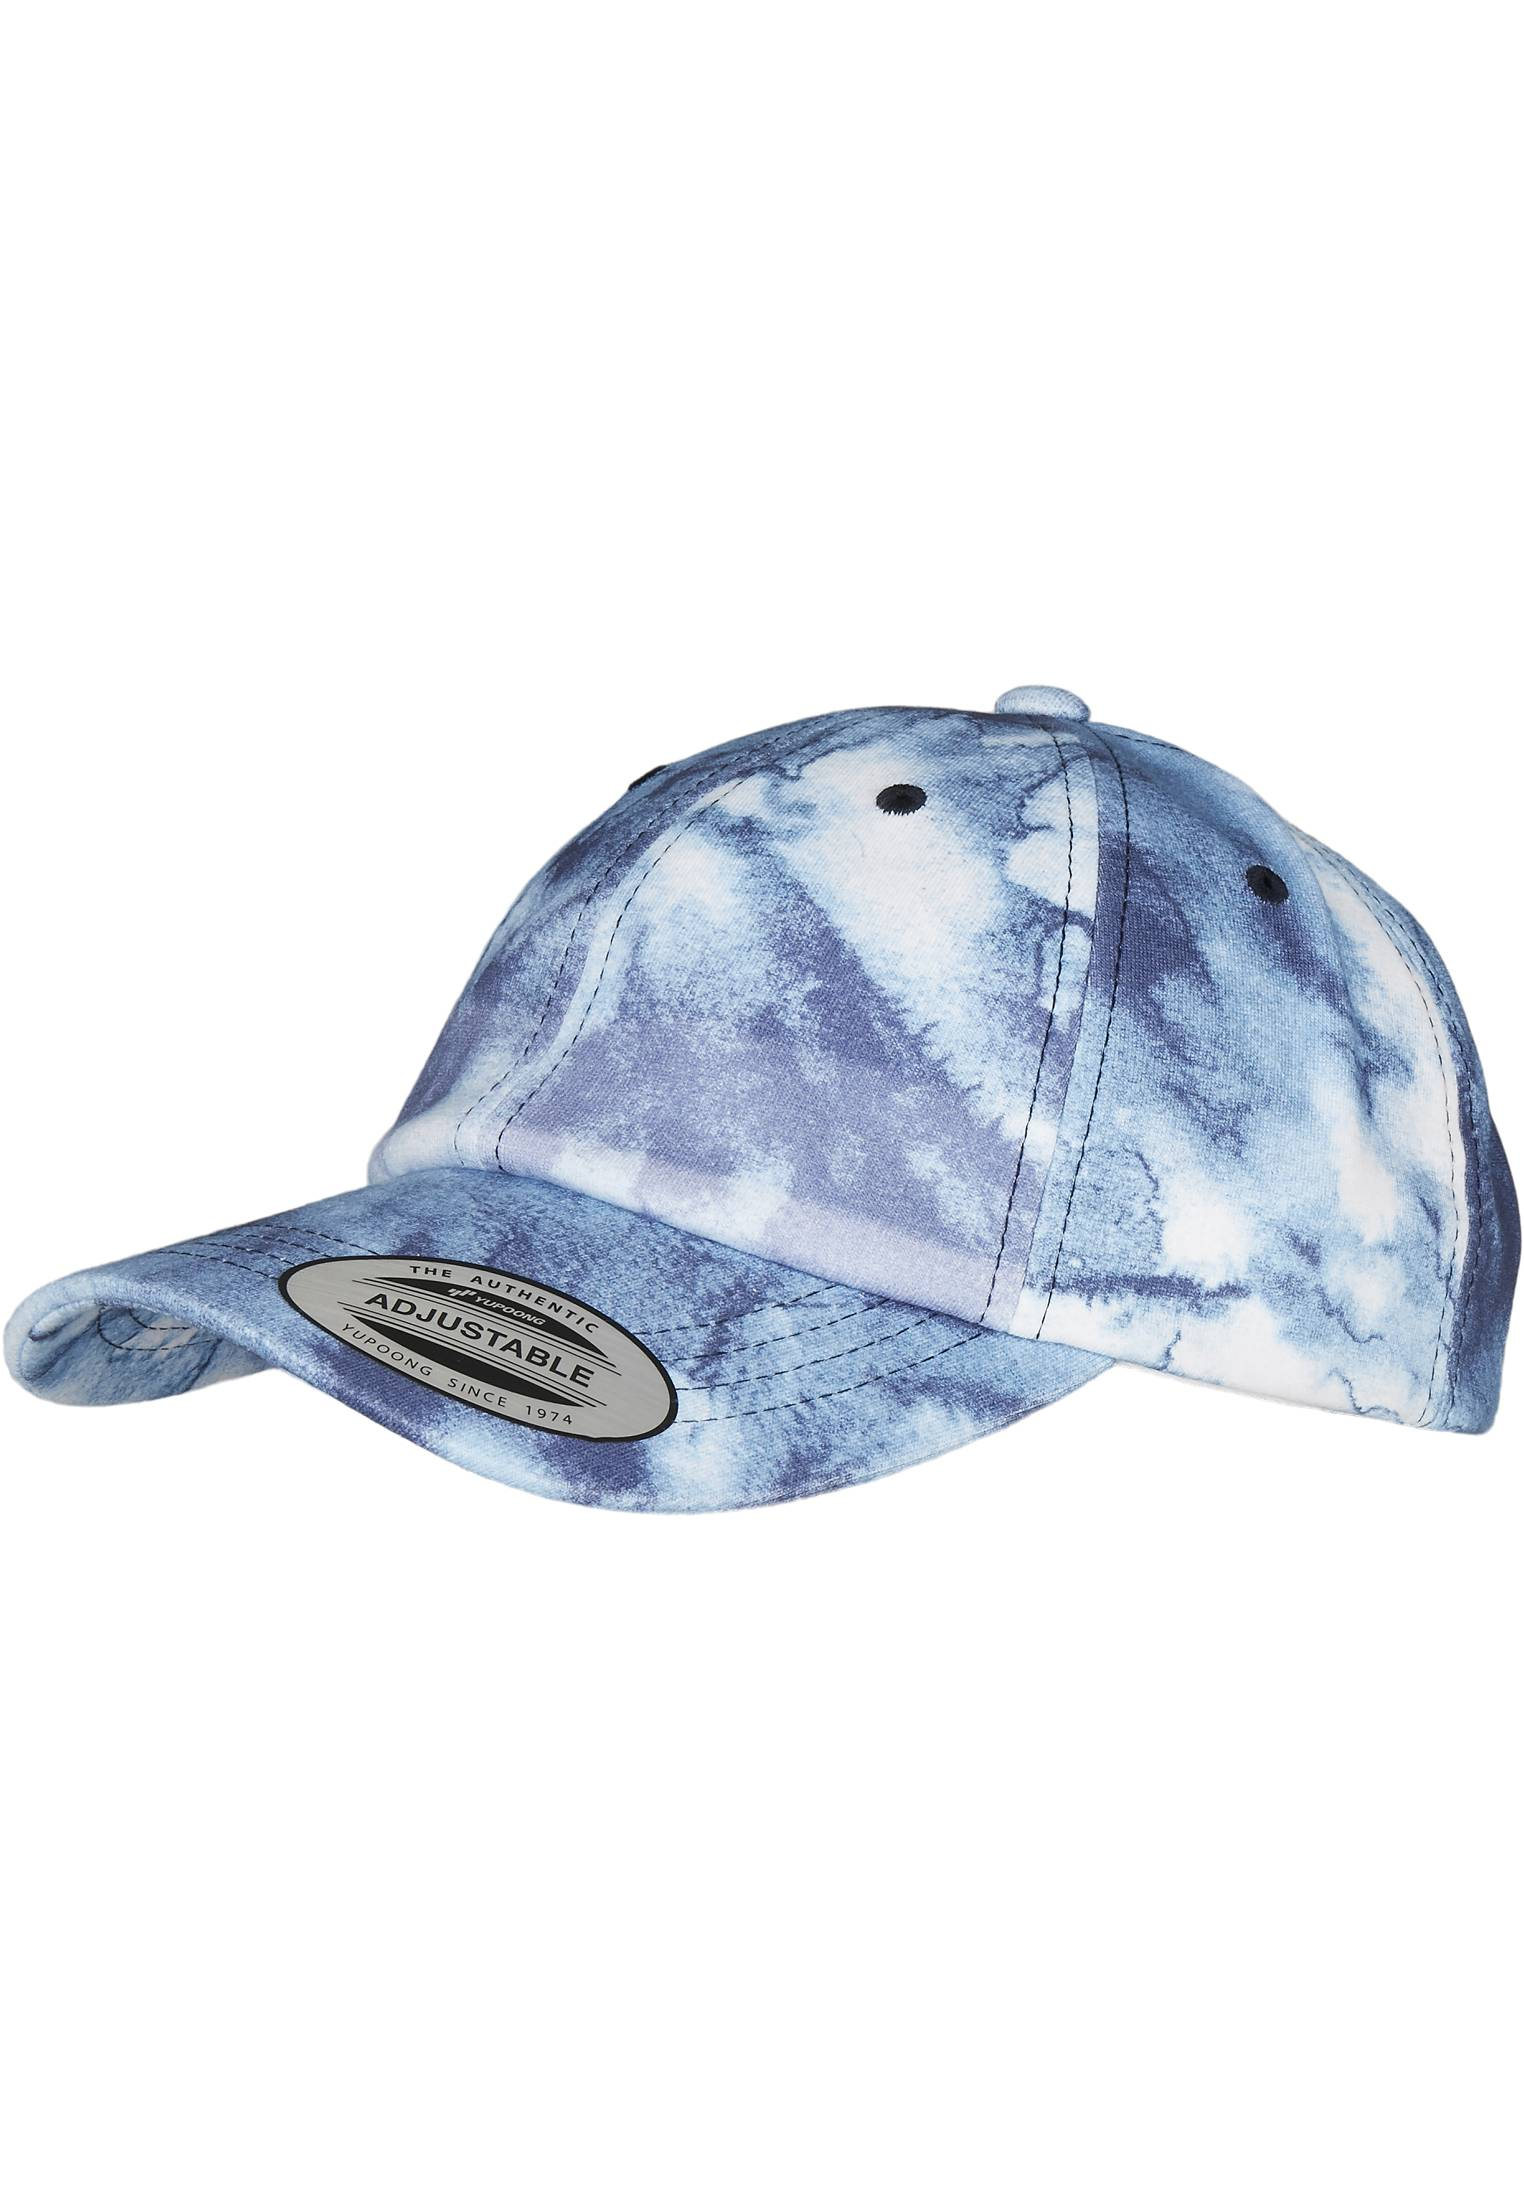 Urban Classics Low Profile Batic Dye Cap navy 6 - One Size